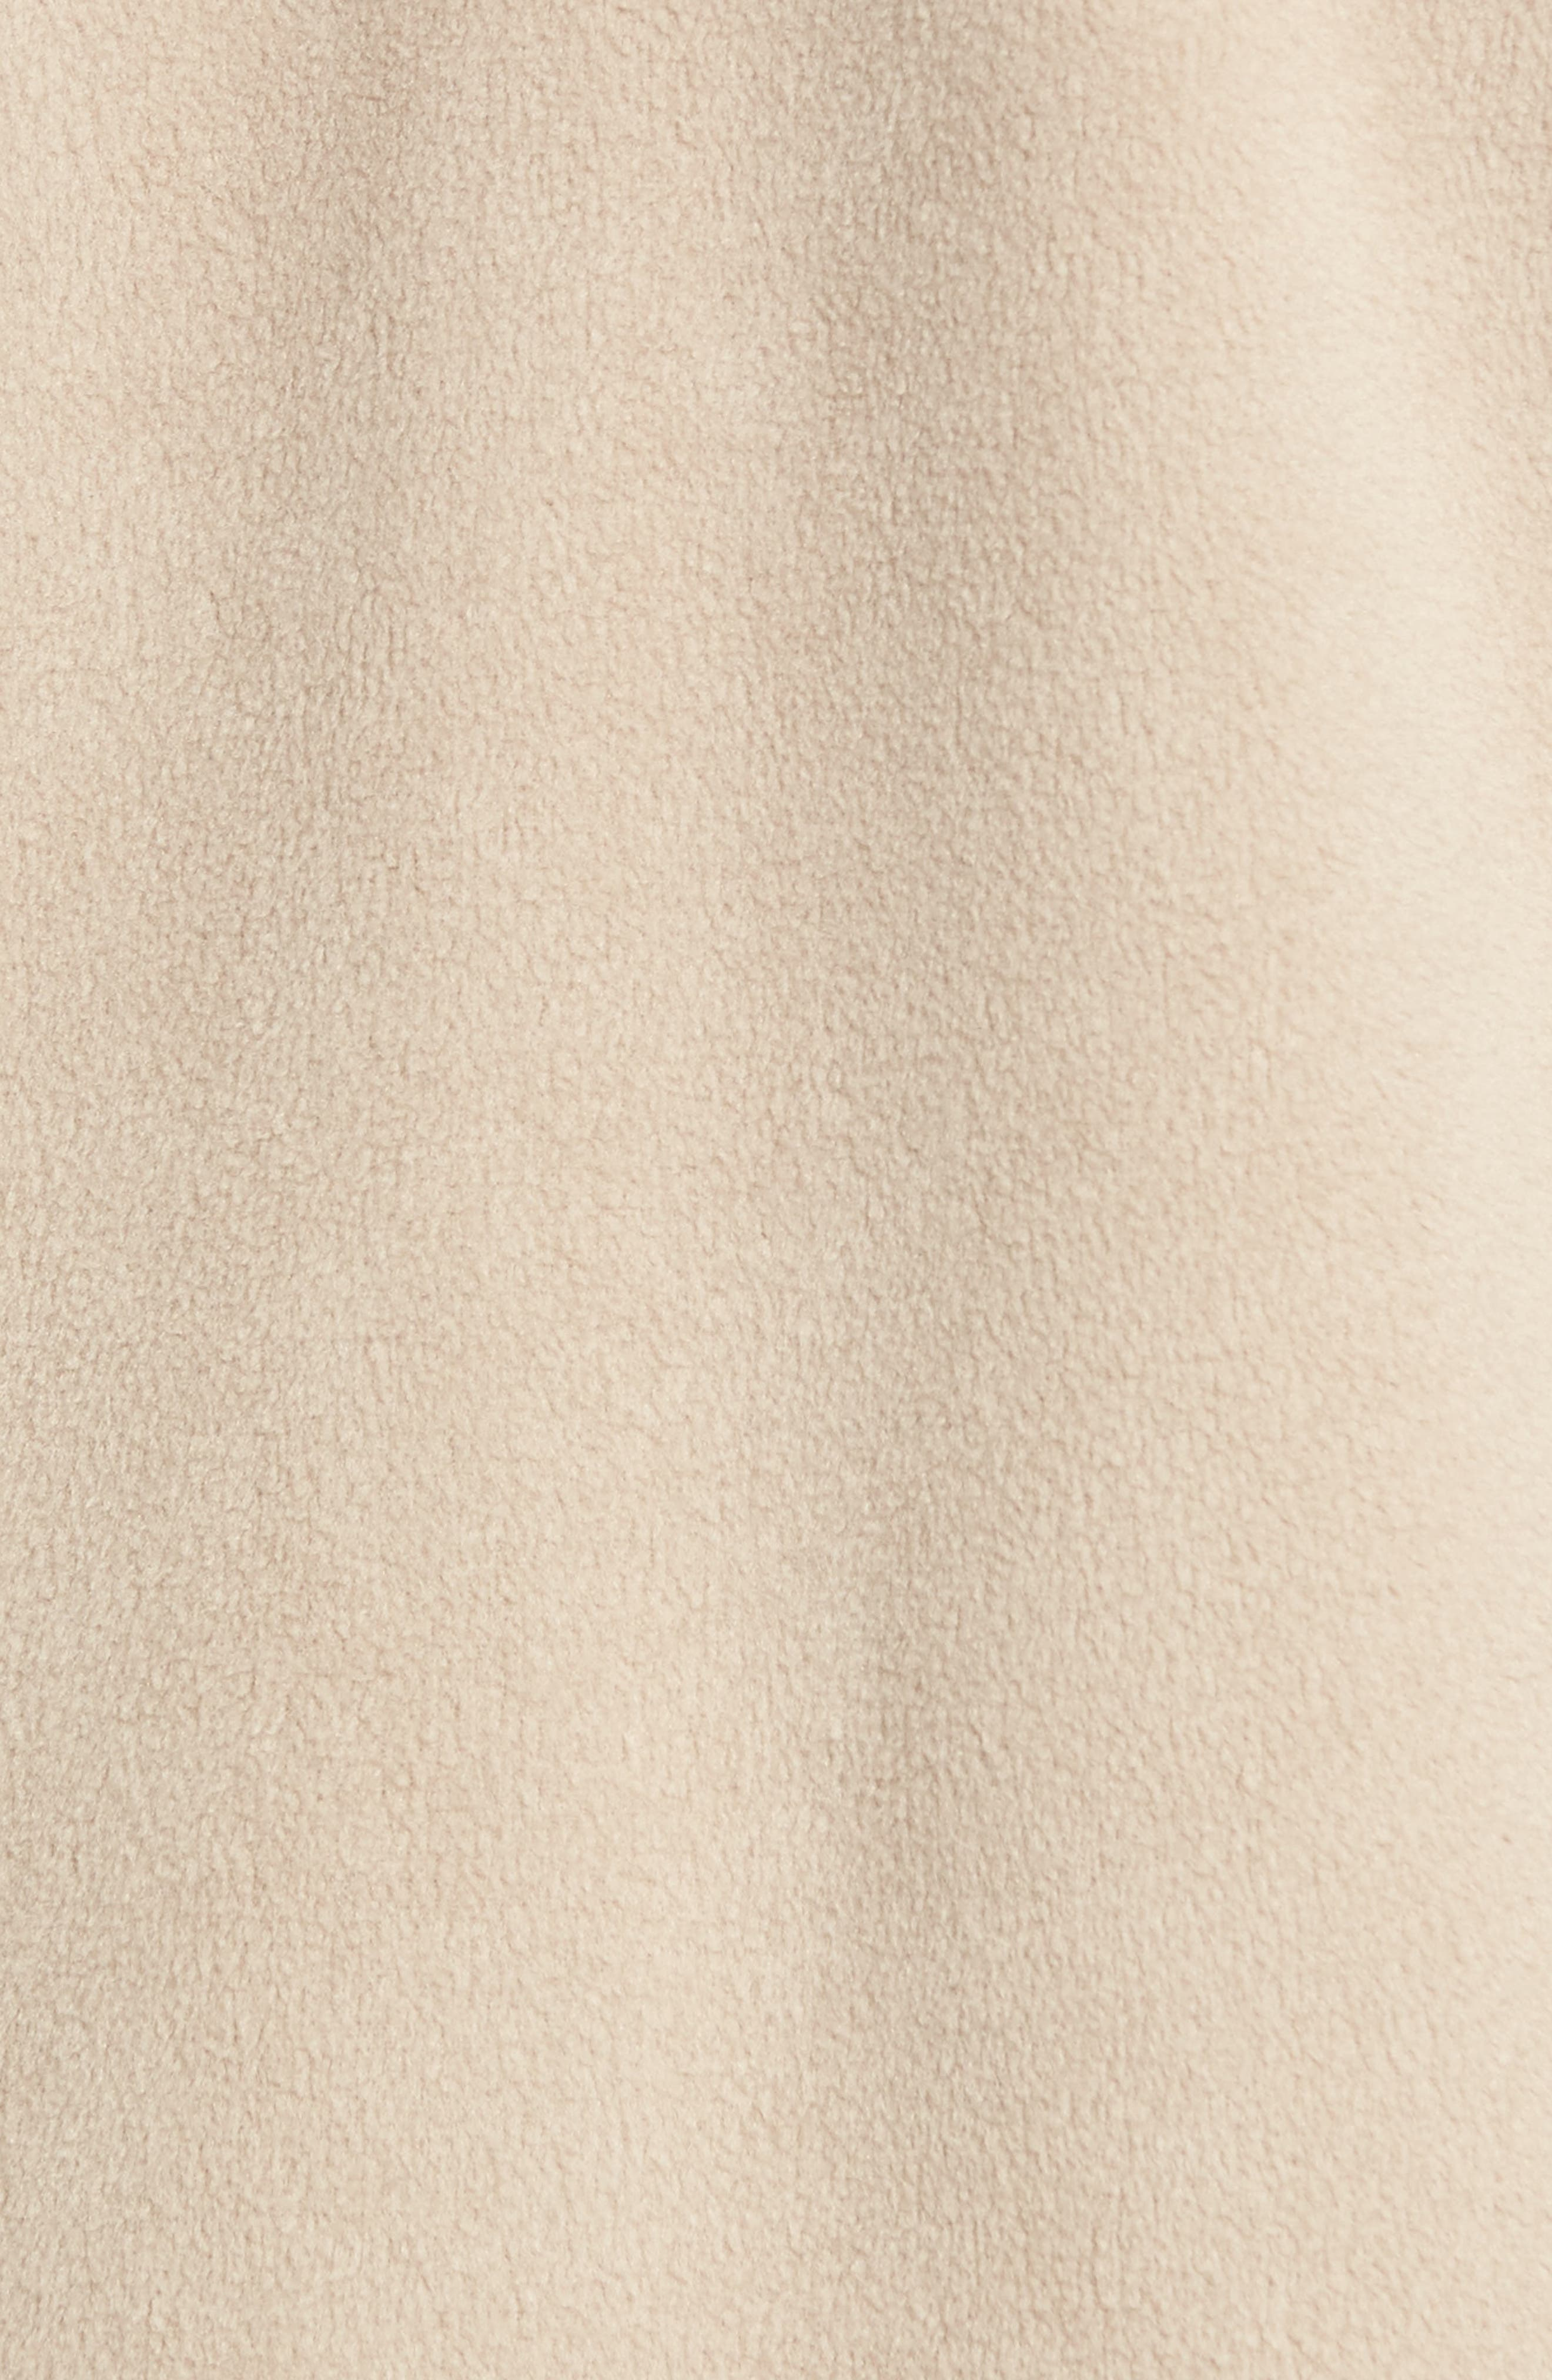 Bonded Polar Fleece Lined Pullover,                             Alternate thumbnail 5, color,                             Sand